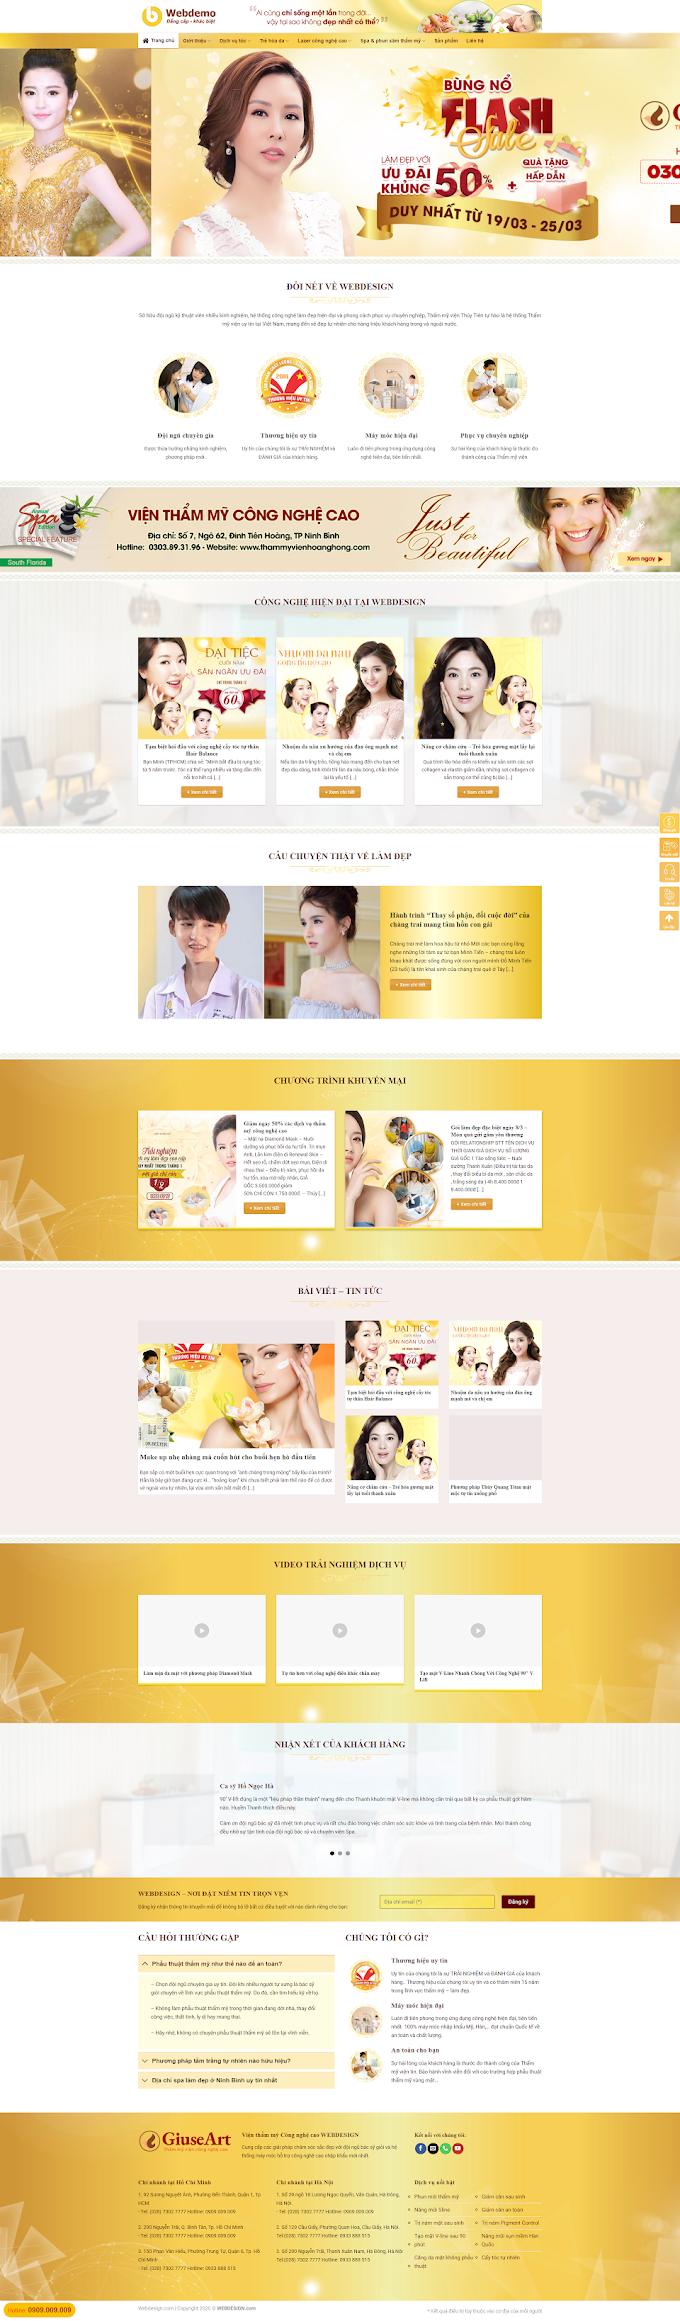 Mẫu website về Spa làm đẹp